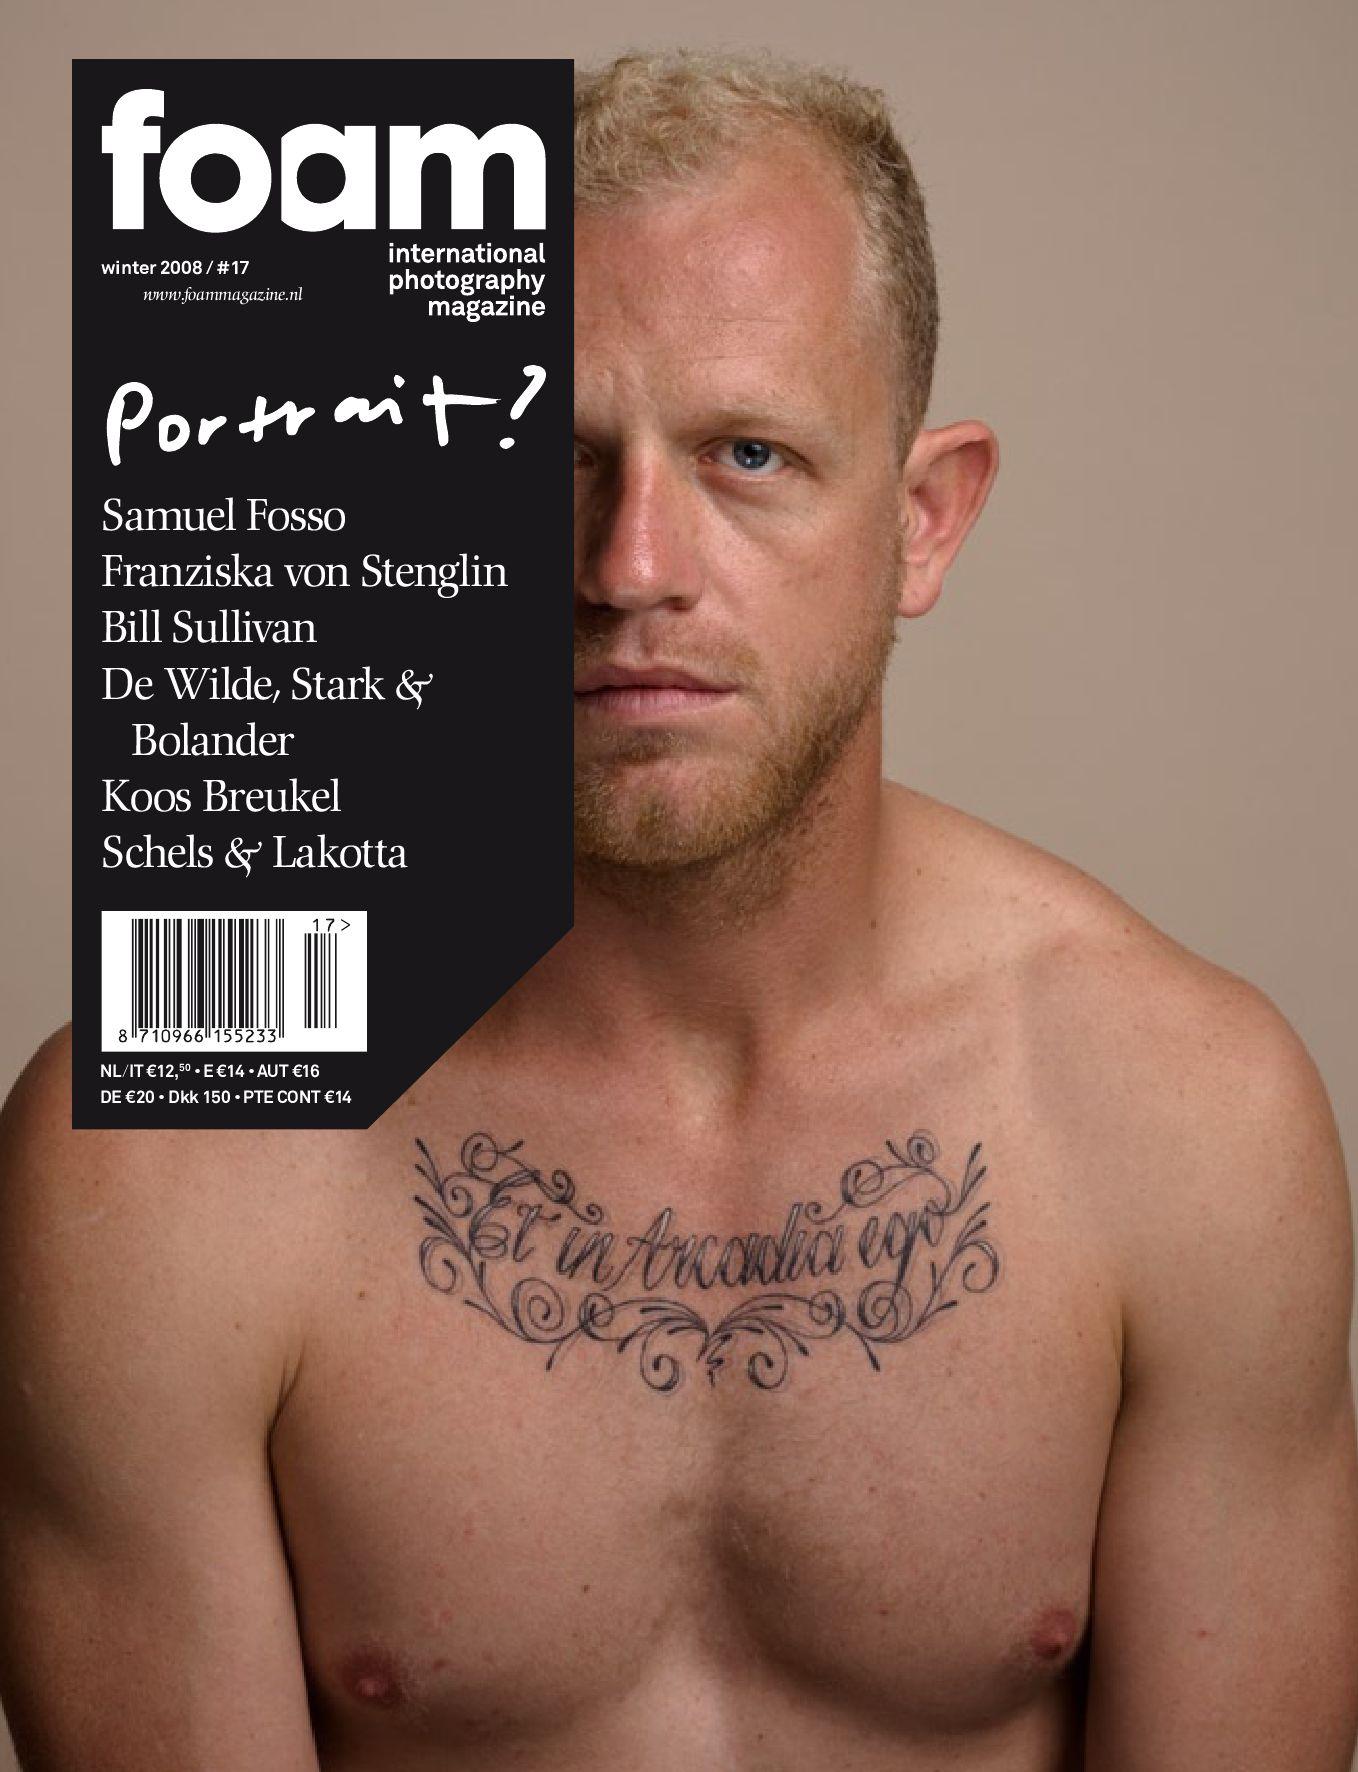 3565f1195f PREVIEW Foam Magazine Issue  17 Portrait  by Foam Magazine - issuu